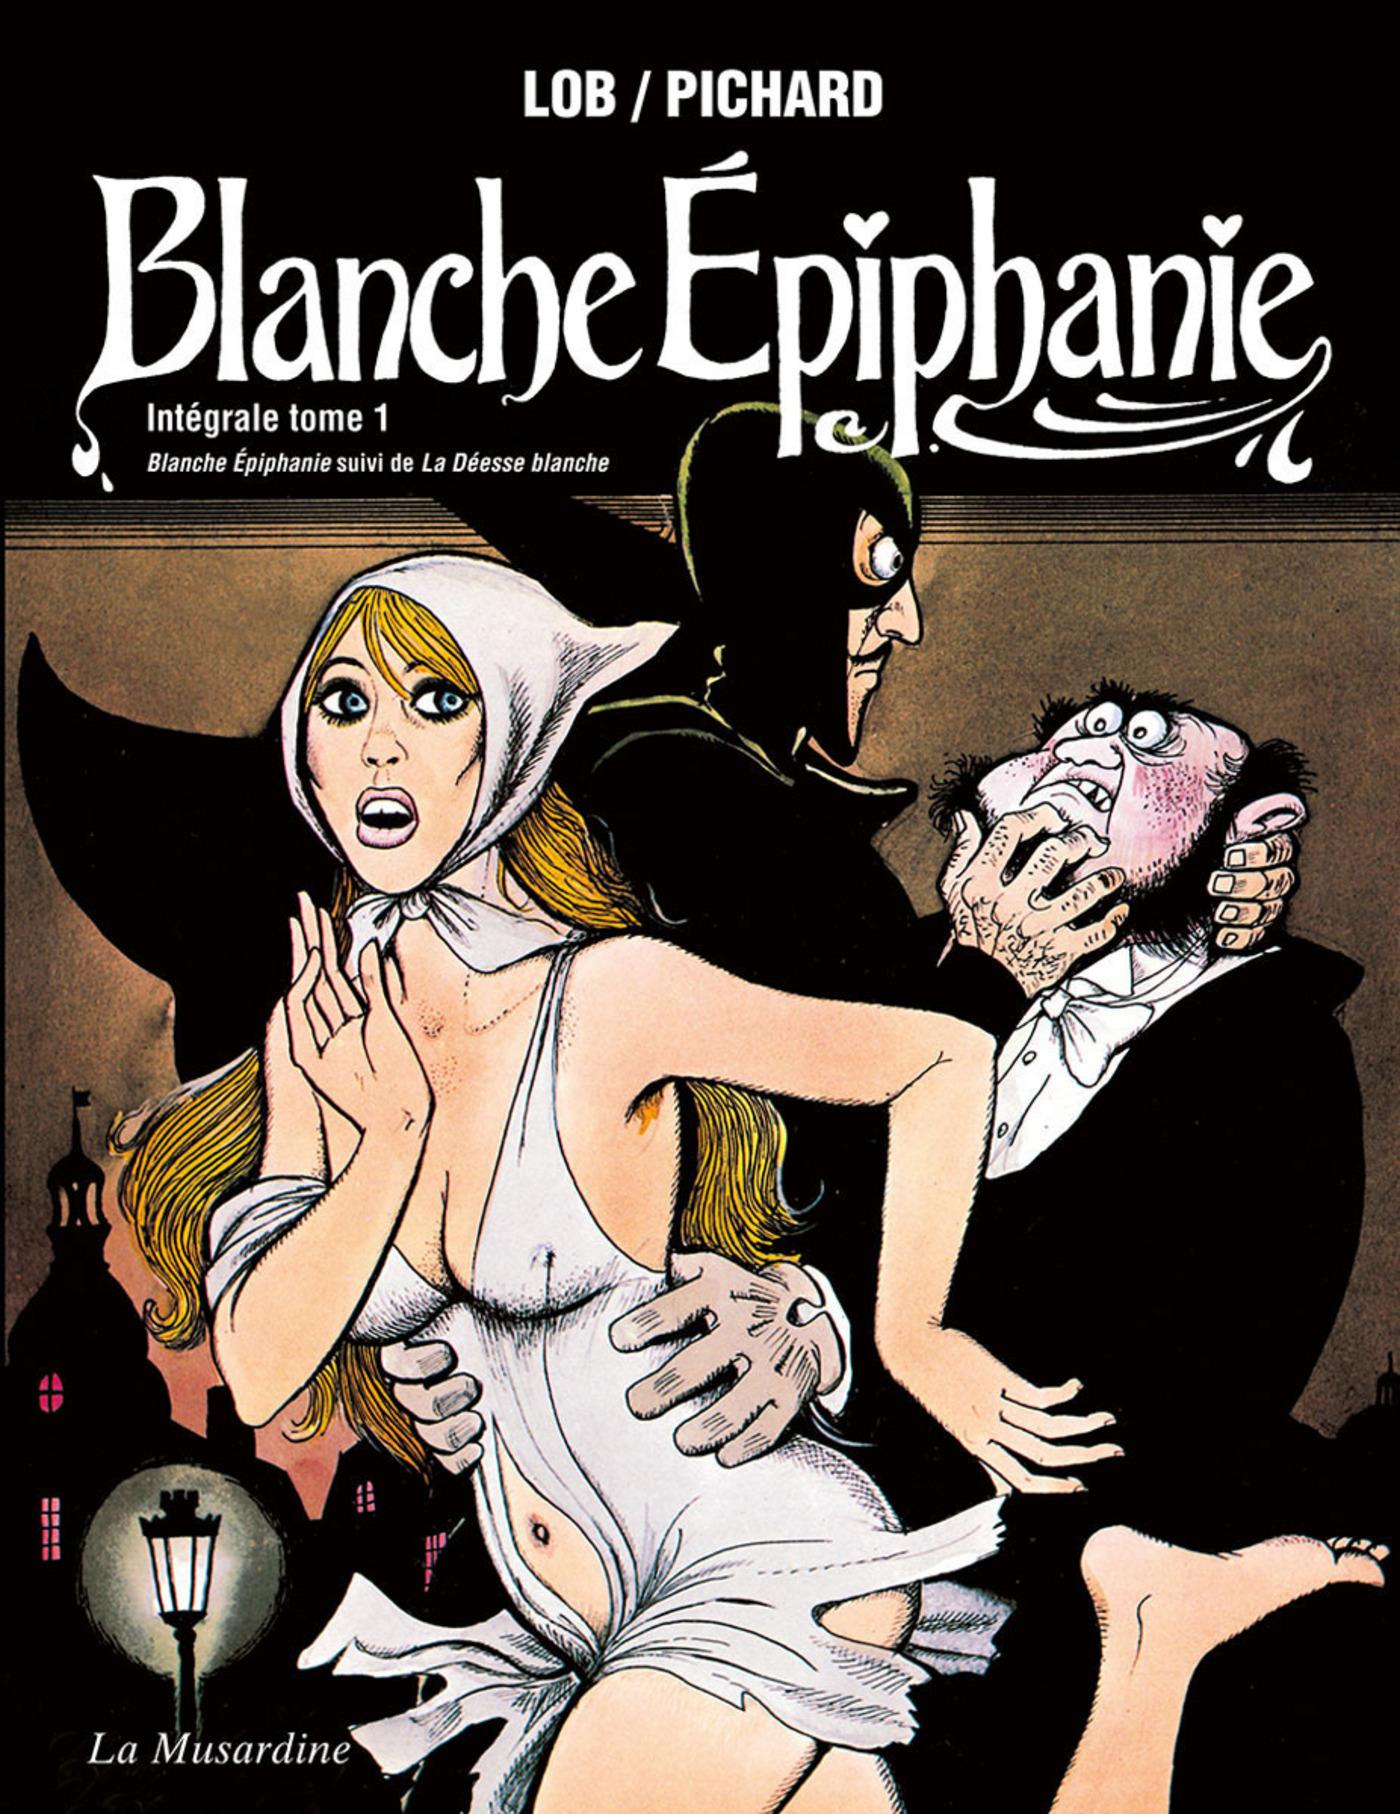 Blanche Epiphanie Intégrale - tome 1 (ebook)